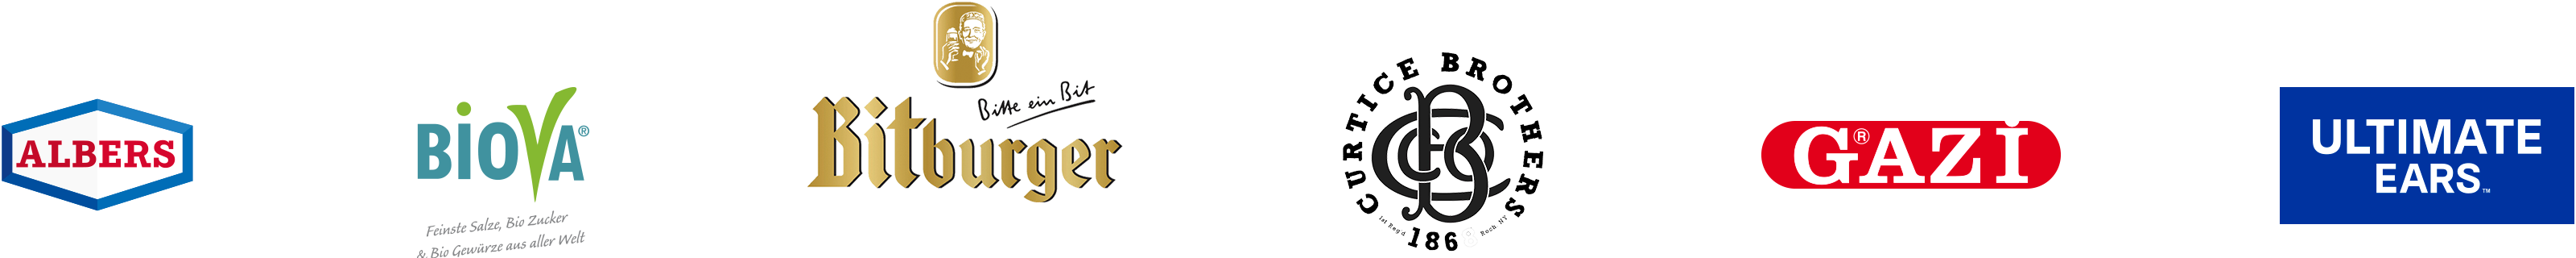 Weber Homeevents Partner Logos Desktop 1